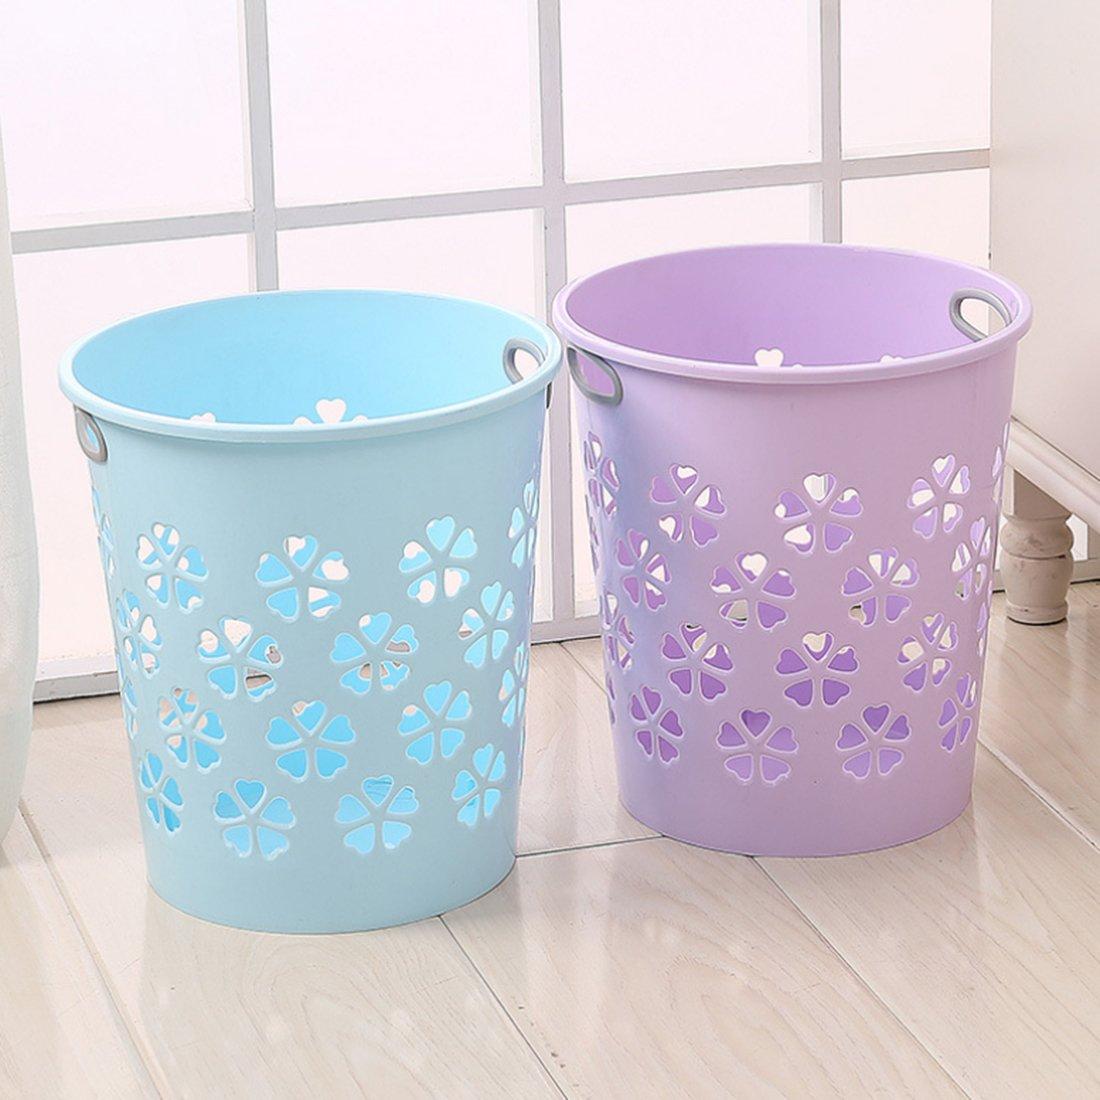 XSHION Waste Paper Basket Multi-purpose Hollowed-out Plastic Rubbish Bin Trash Can (Purple 2 Pack)